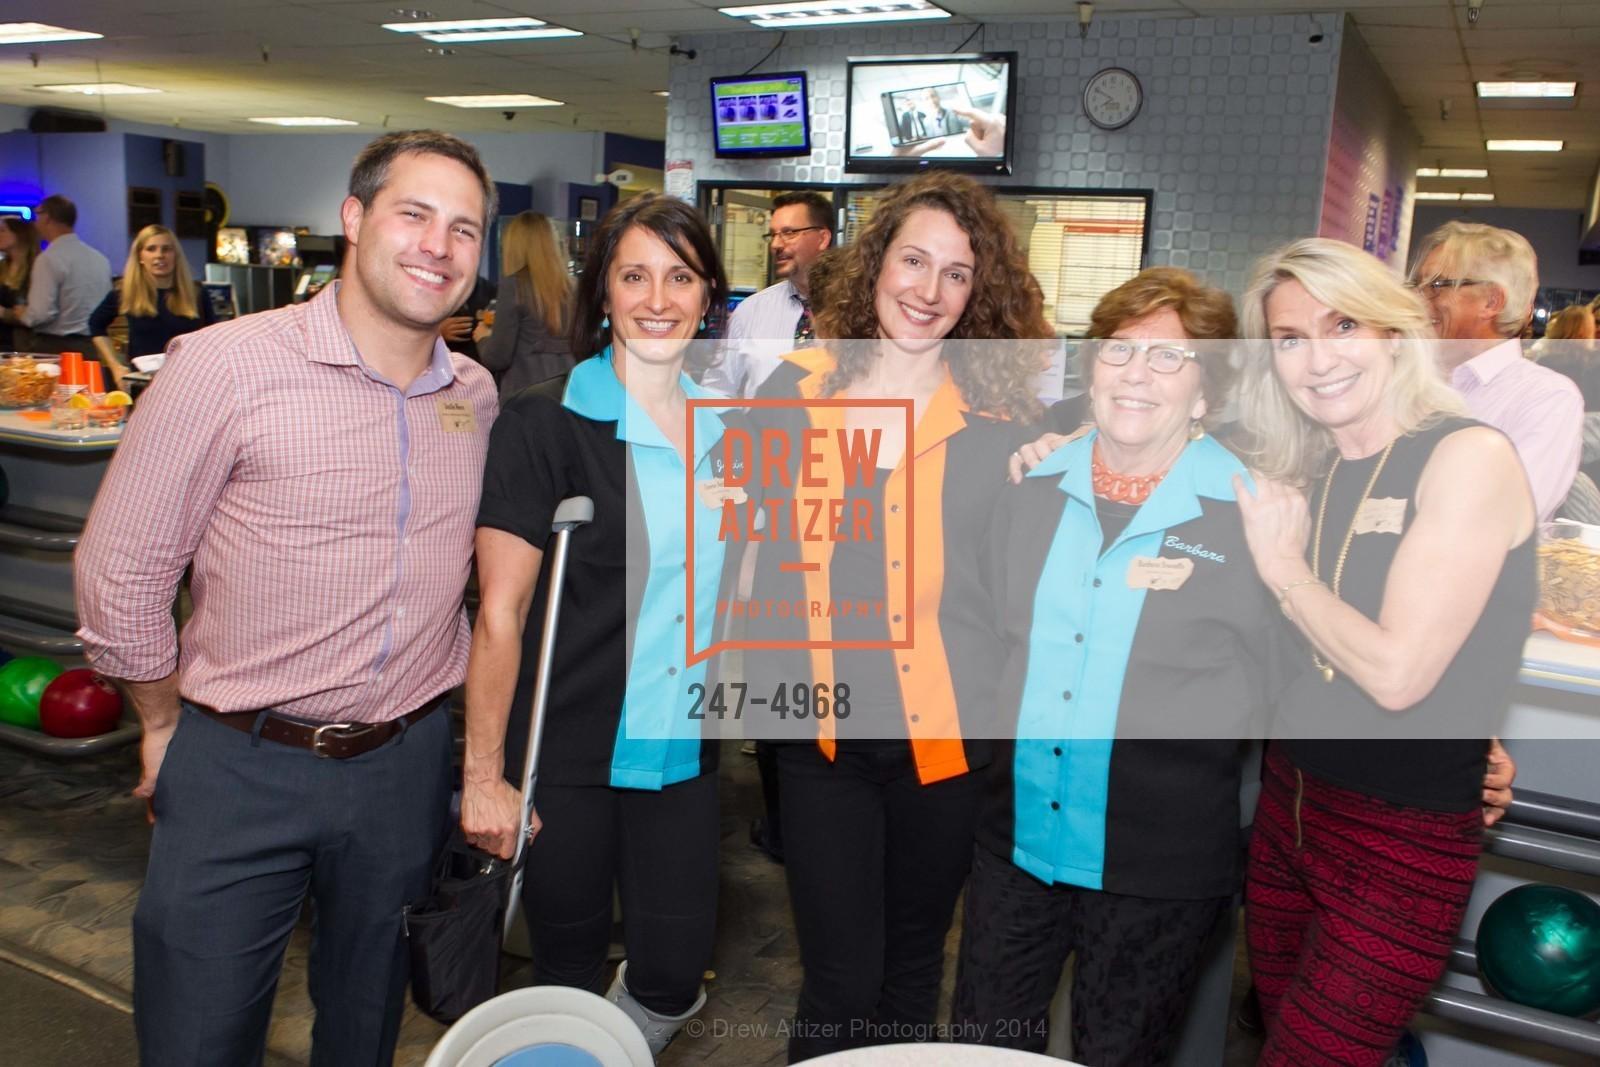 Dustin Moore, Janine Aurichio, Katherine Cro, Barbara Scavullo, Kathy Best, Photo #247-4968